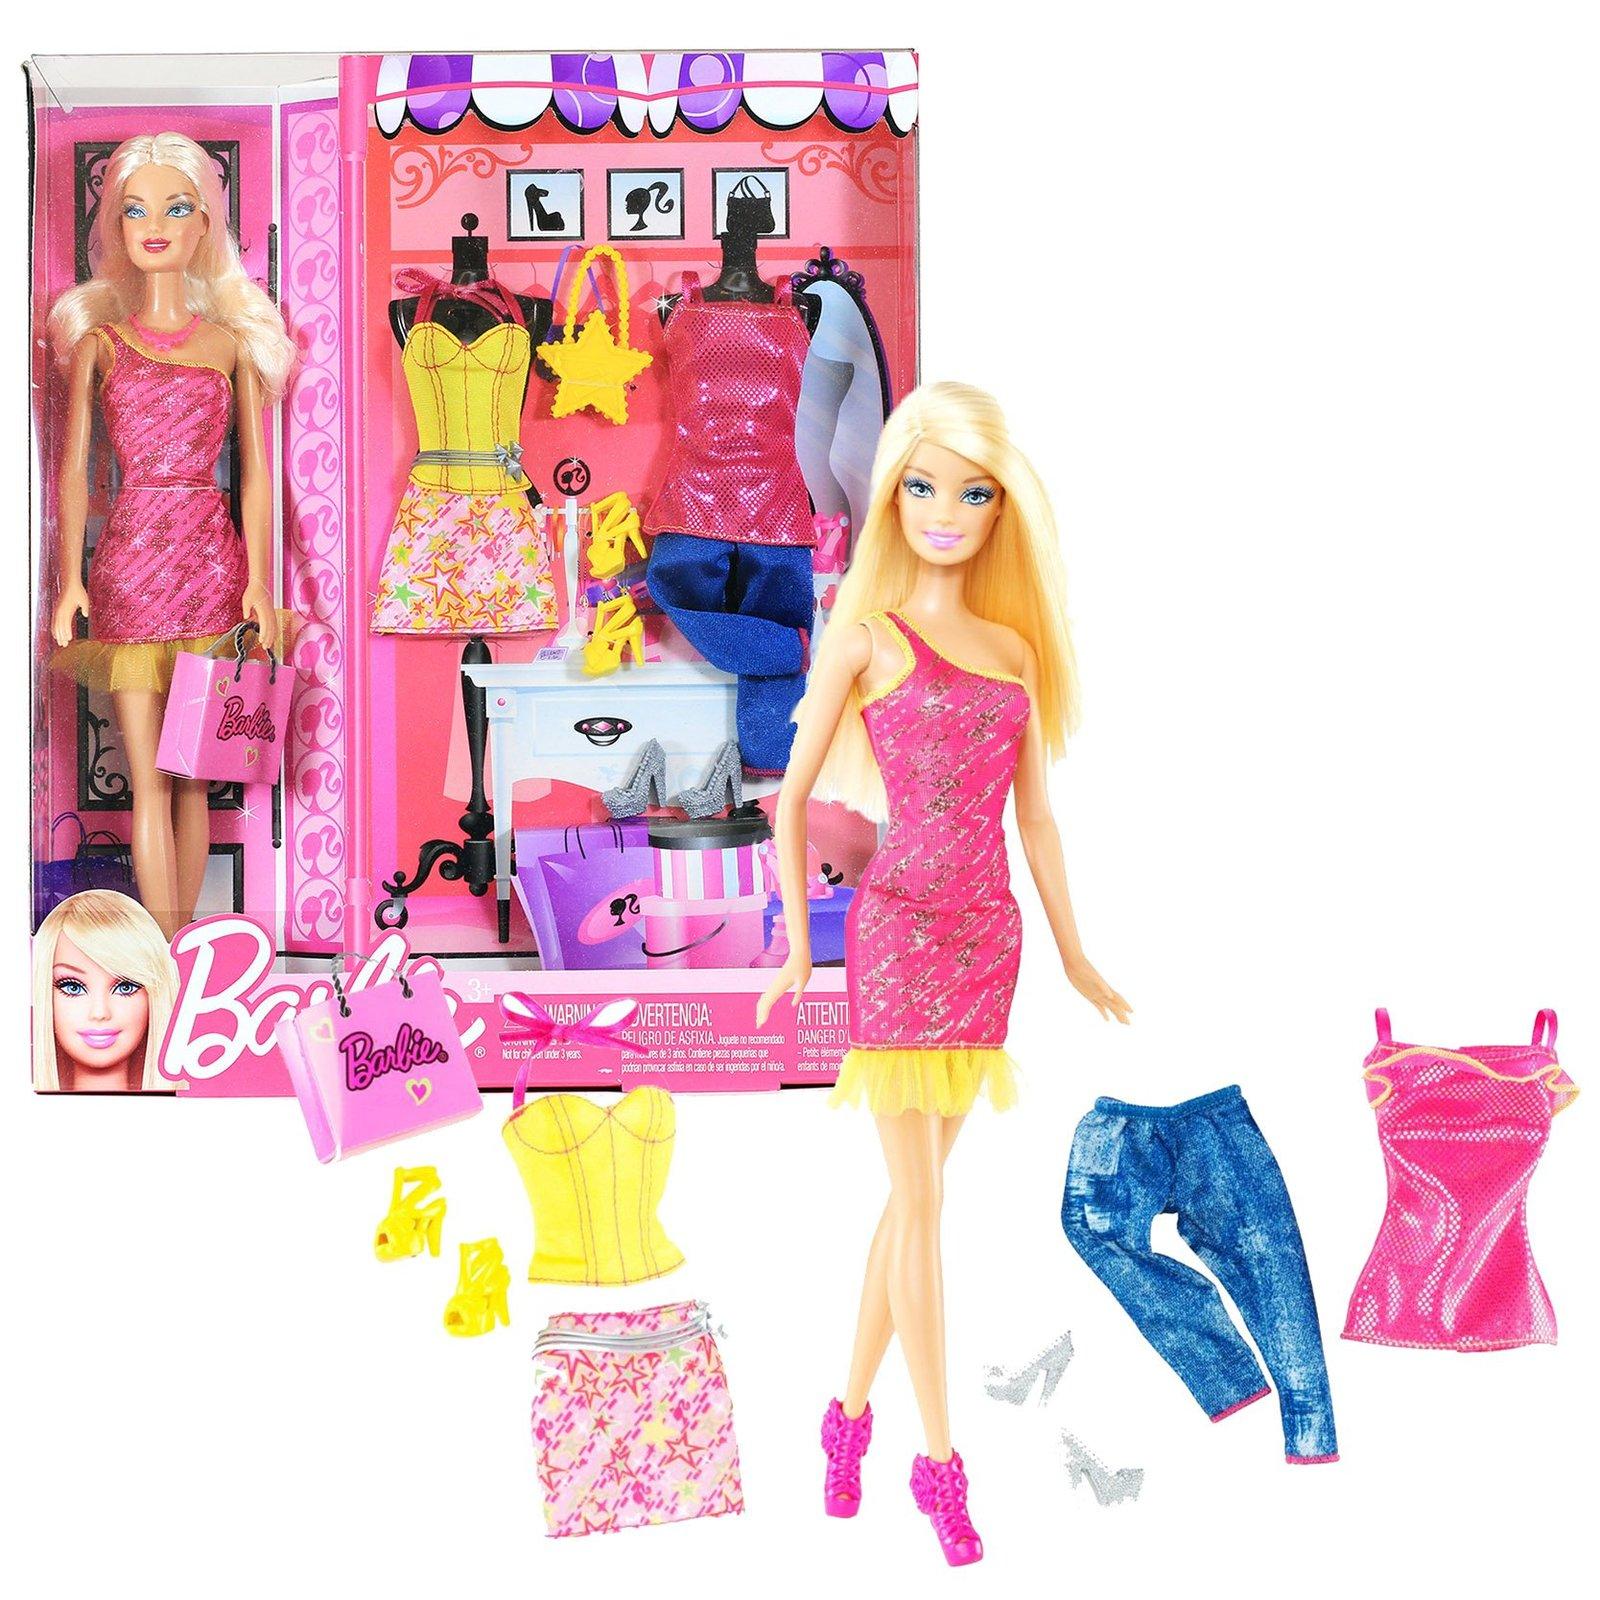 Barbie doll online shop